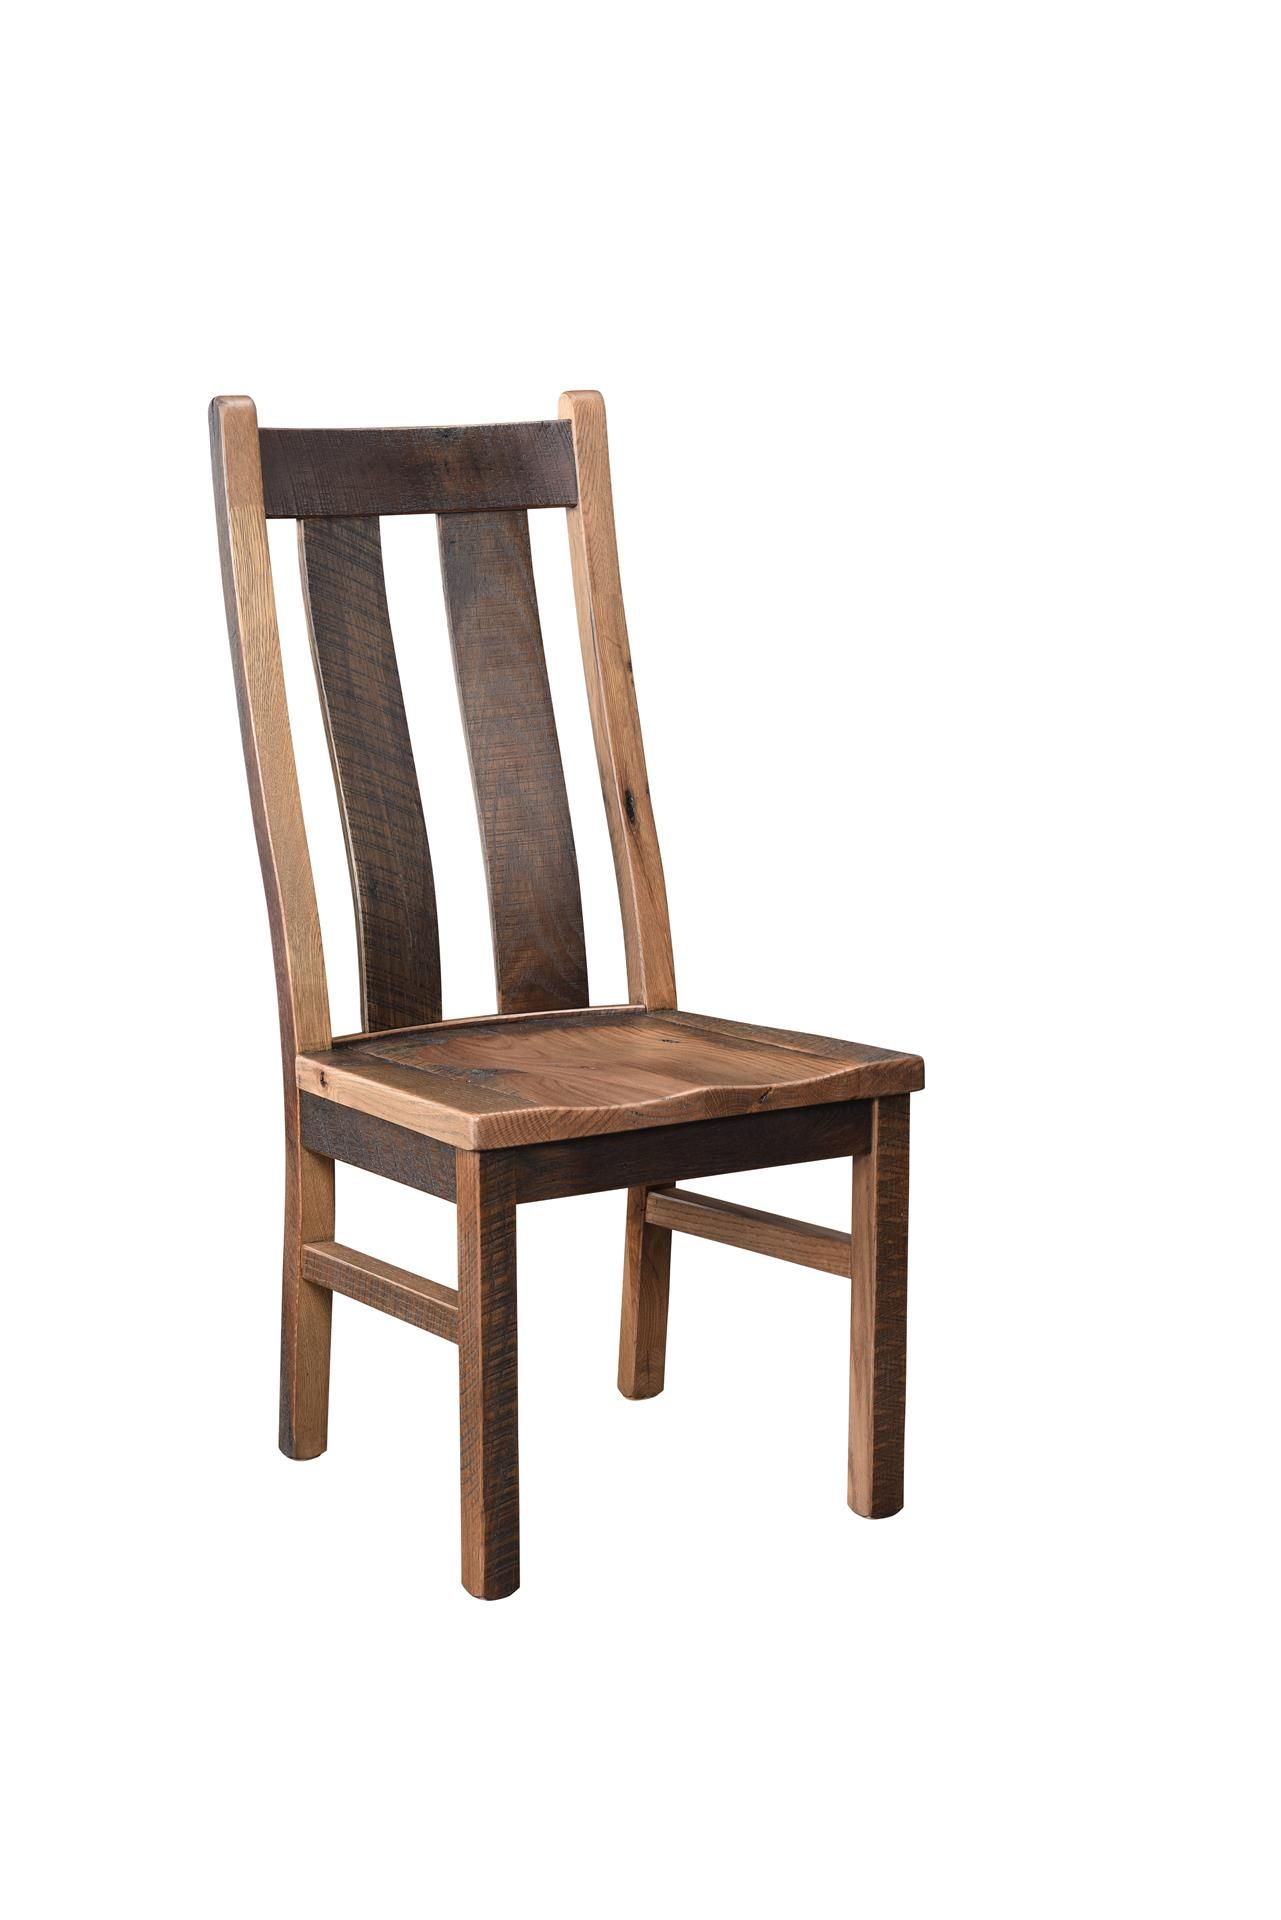 Recycled Barn Wood Bristol Dining Chair FurnitureDining